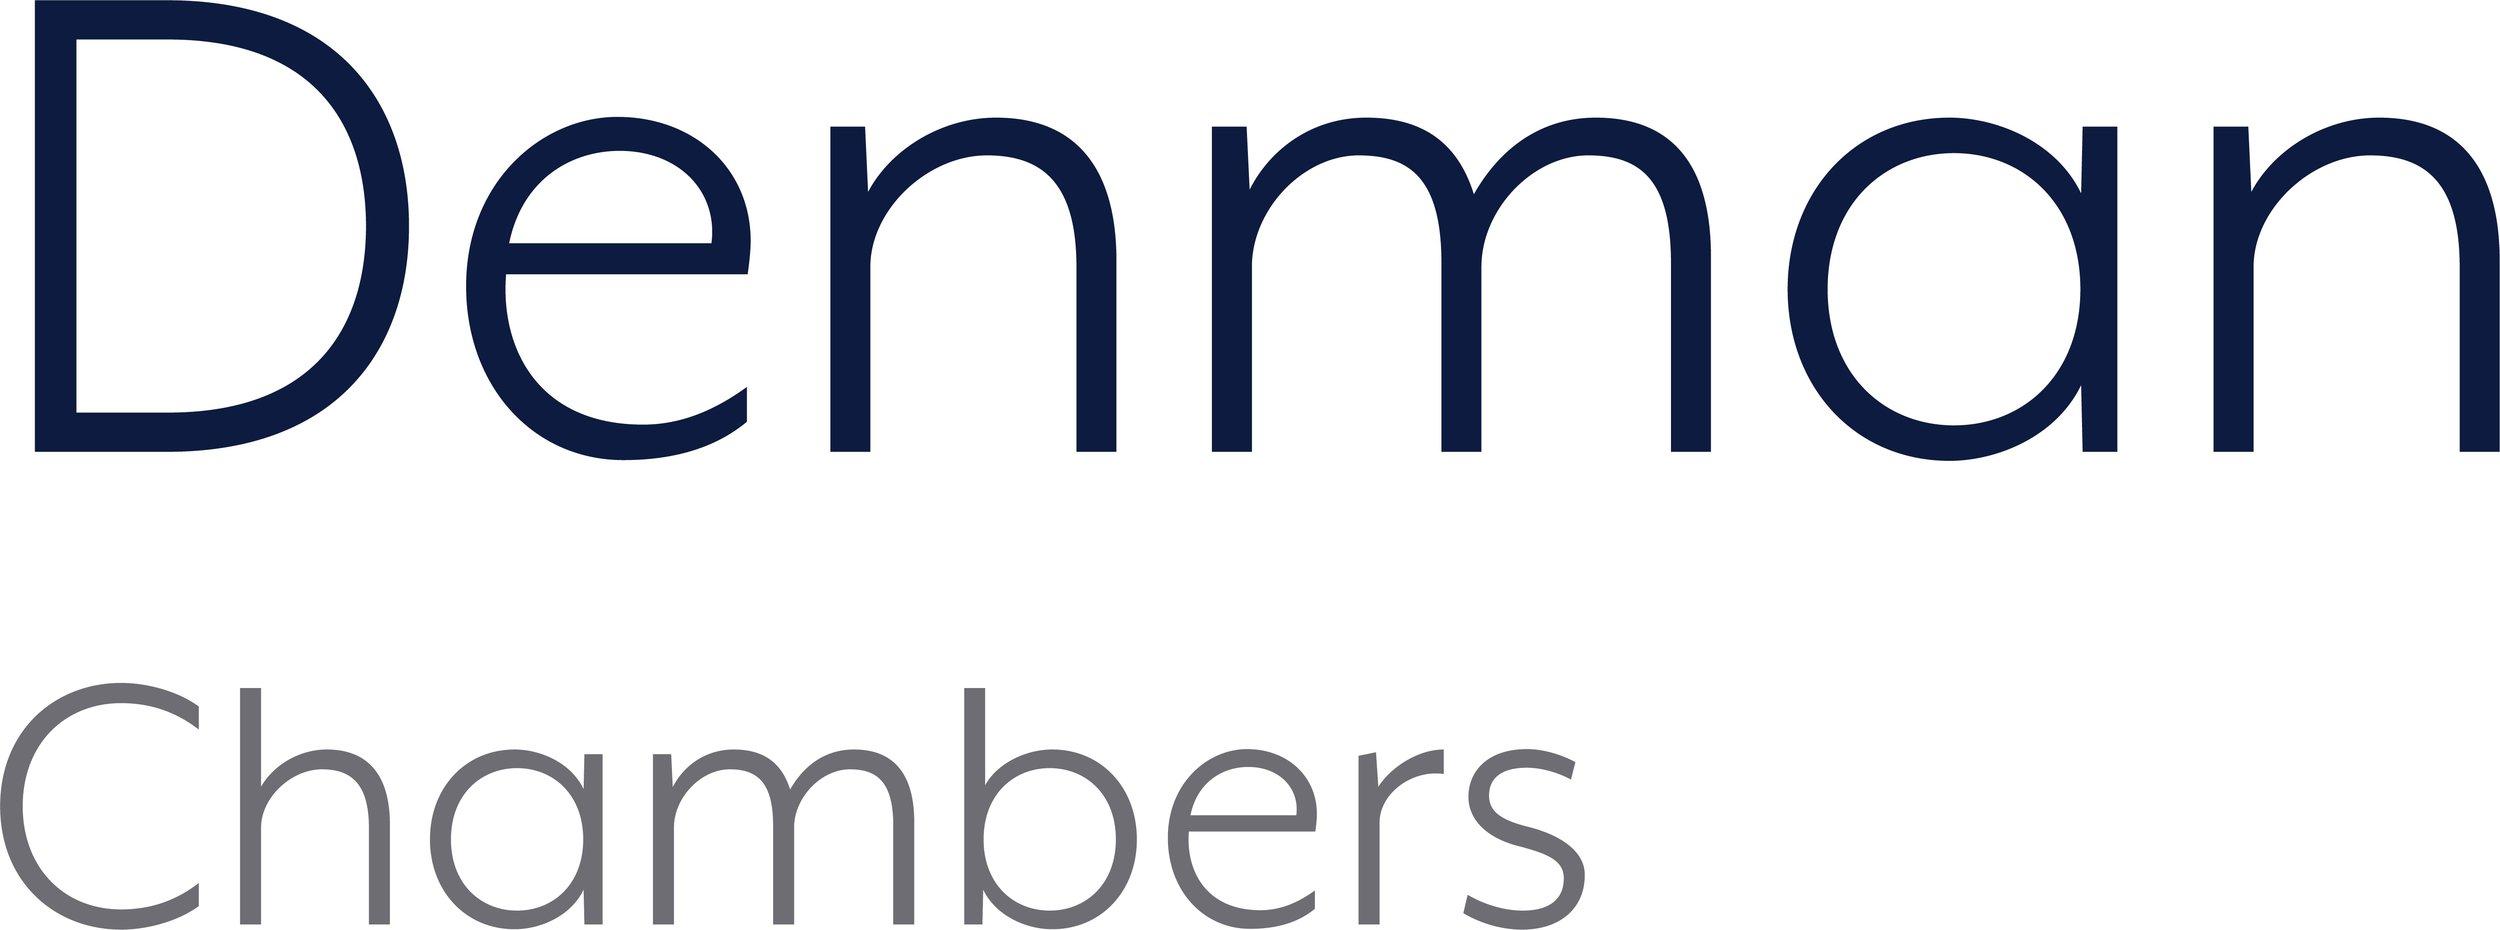 Denman_Chamber_logo.jpg